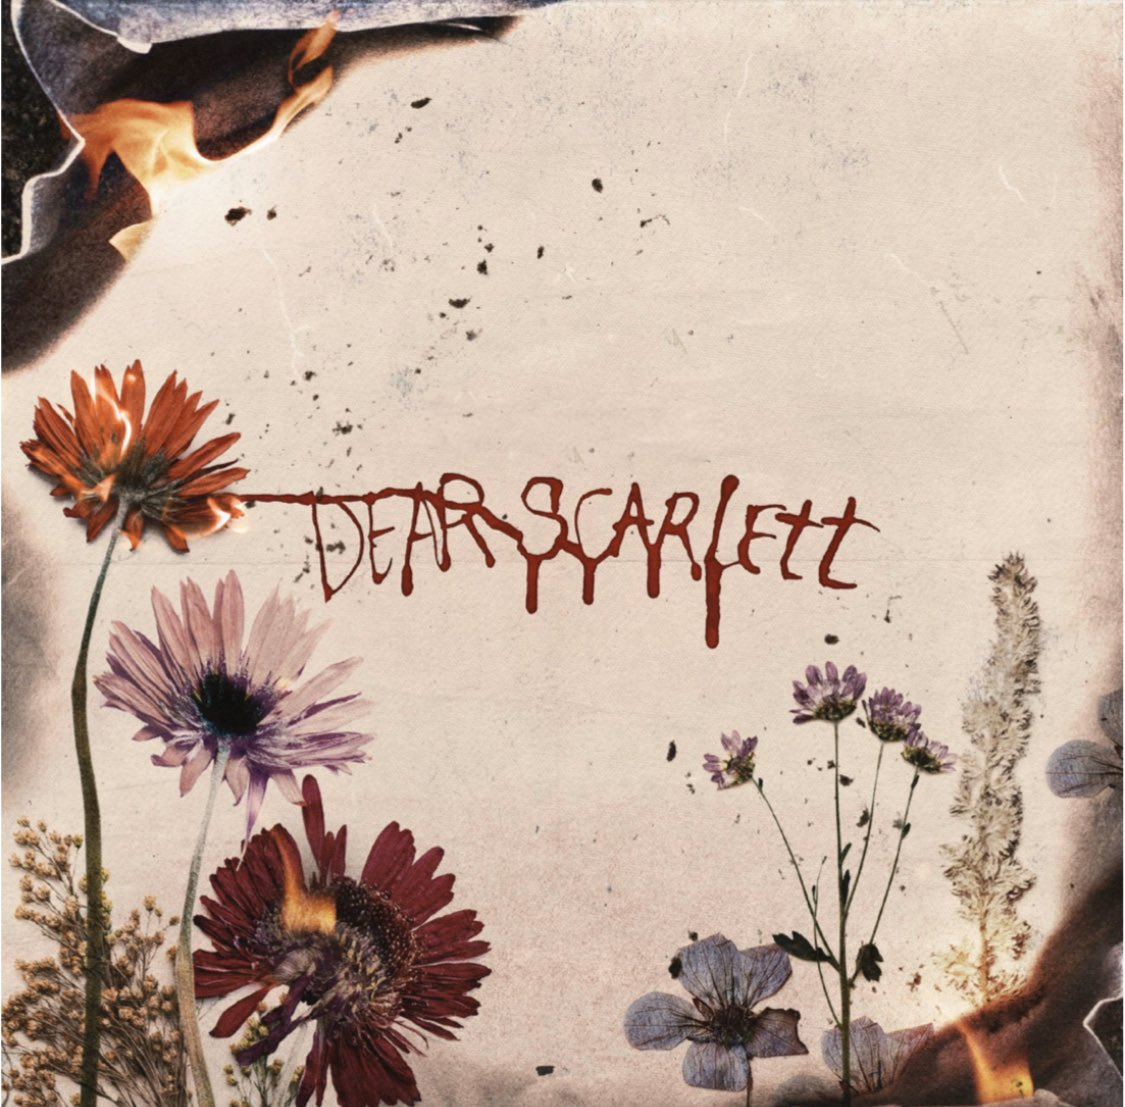 Pre Save my Album 'Dear Scarlett' - drops Sept 8th